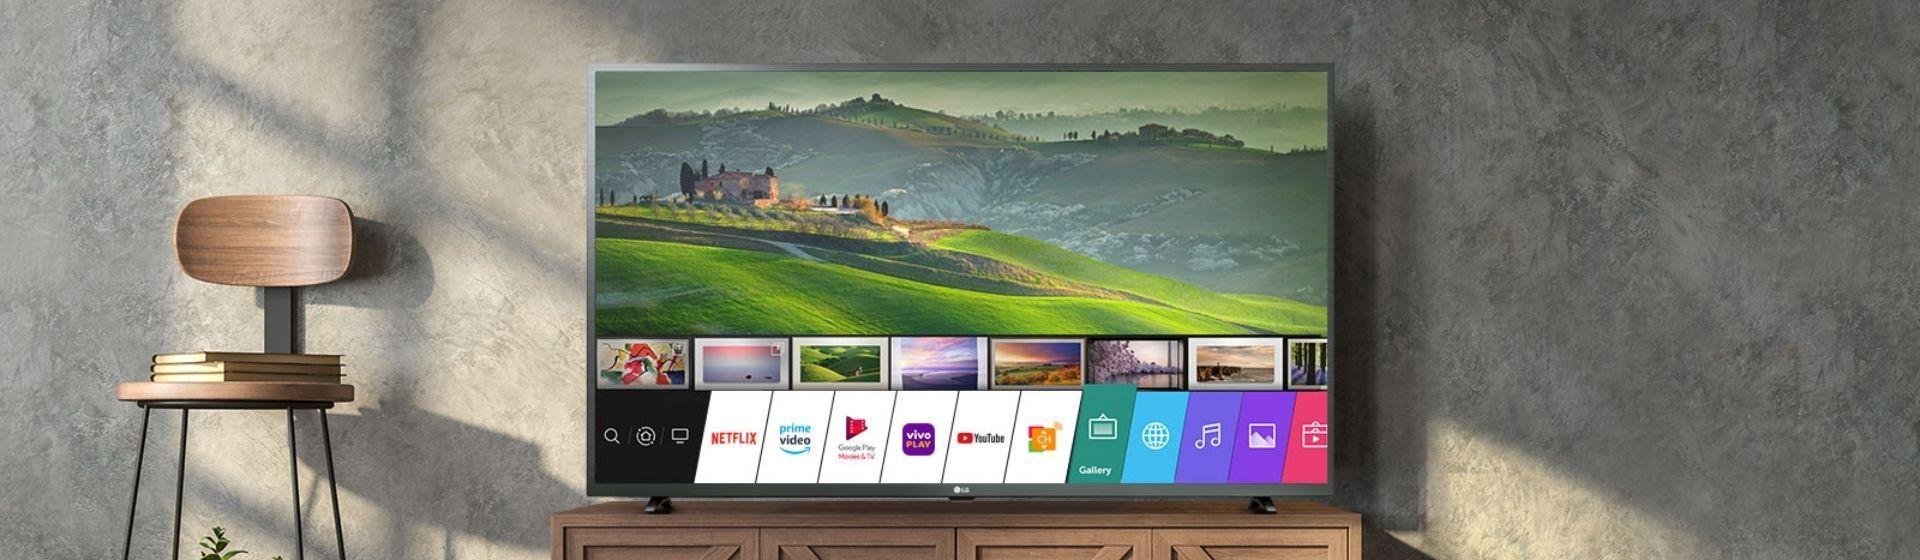 LG LM6300: vale a pena comprar essa smart TV Full HD em 2020?